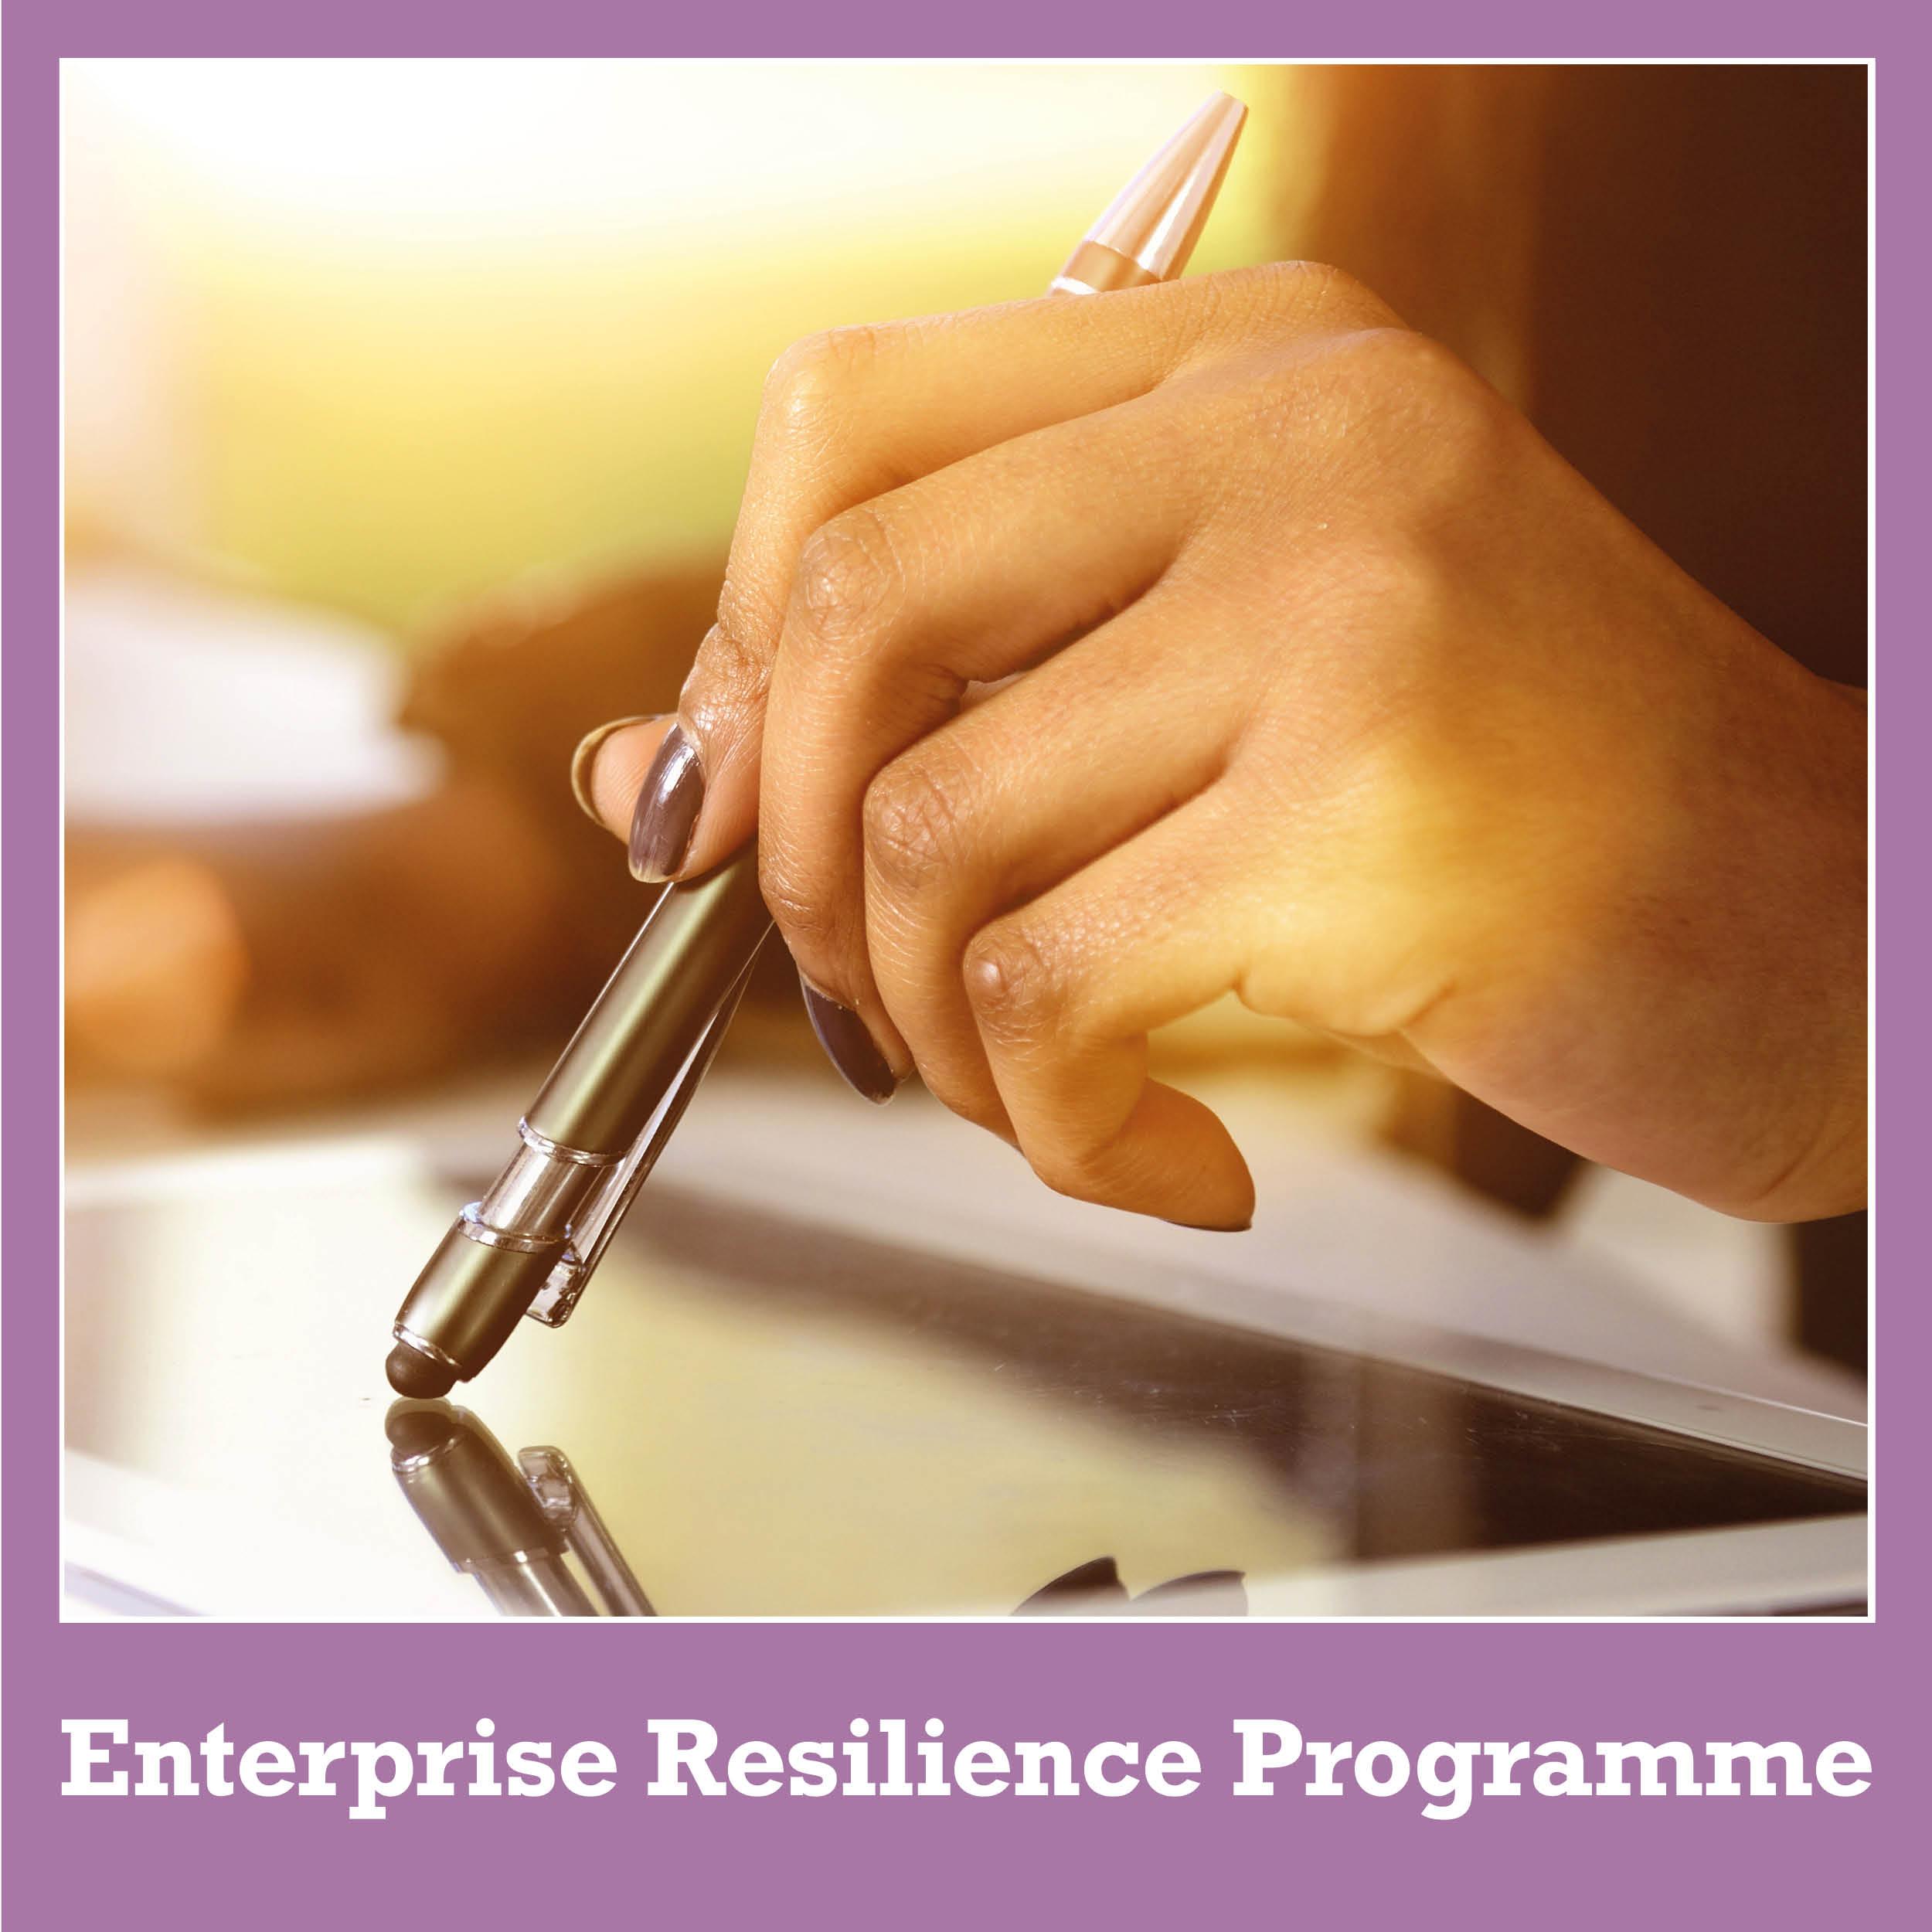 Enterprise Resilience Programme